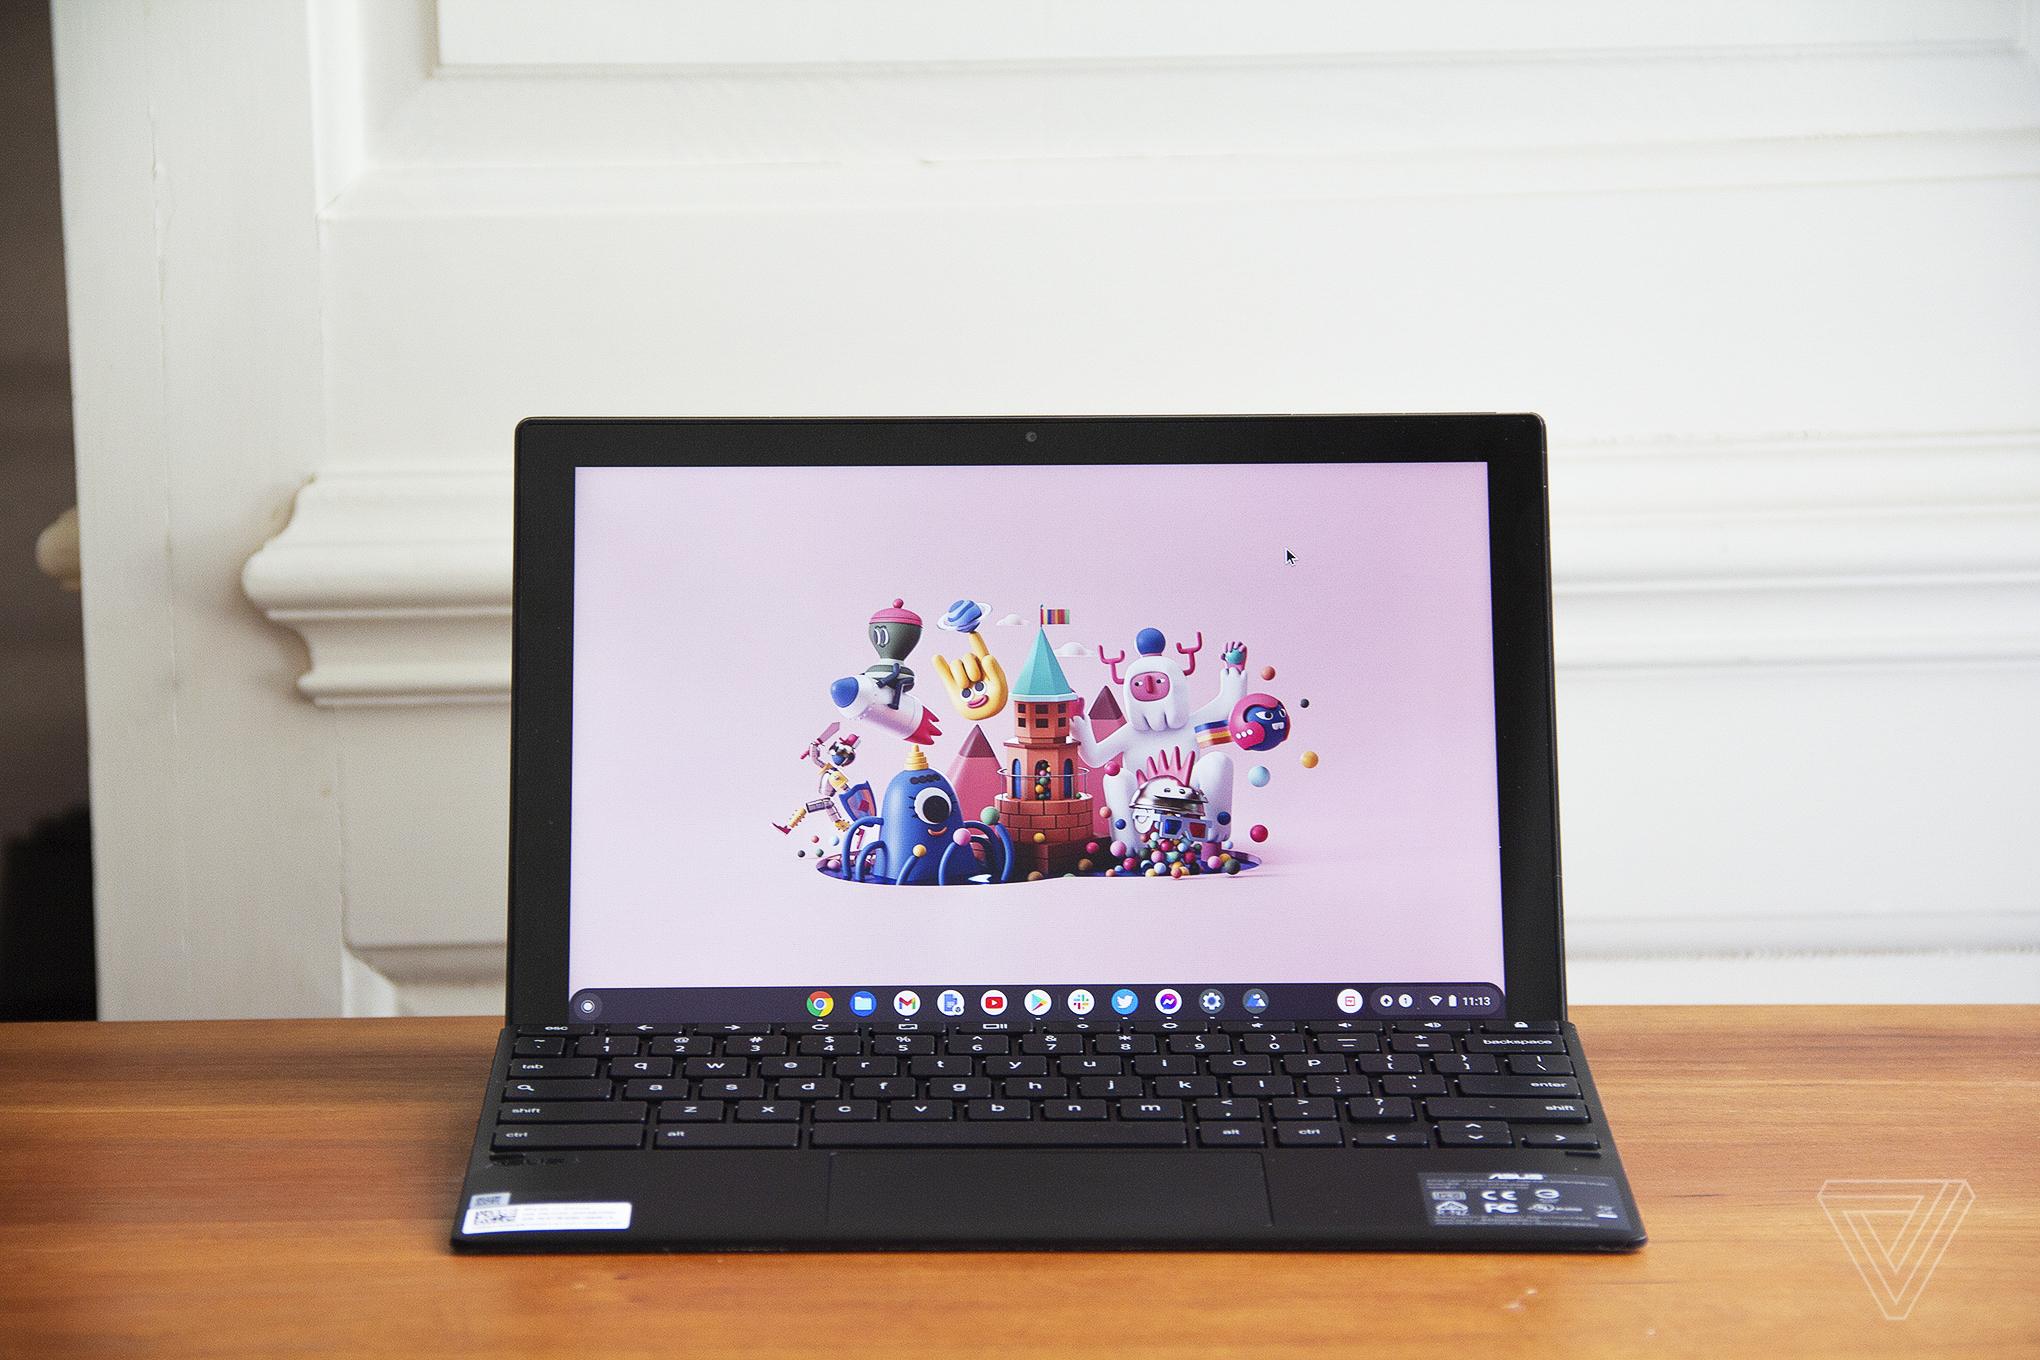 Best Chromebook 2021: Asus Chromebook Detachable CM3